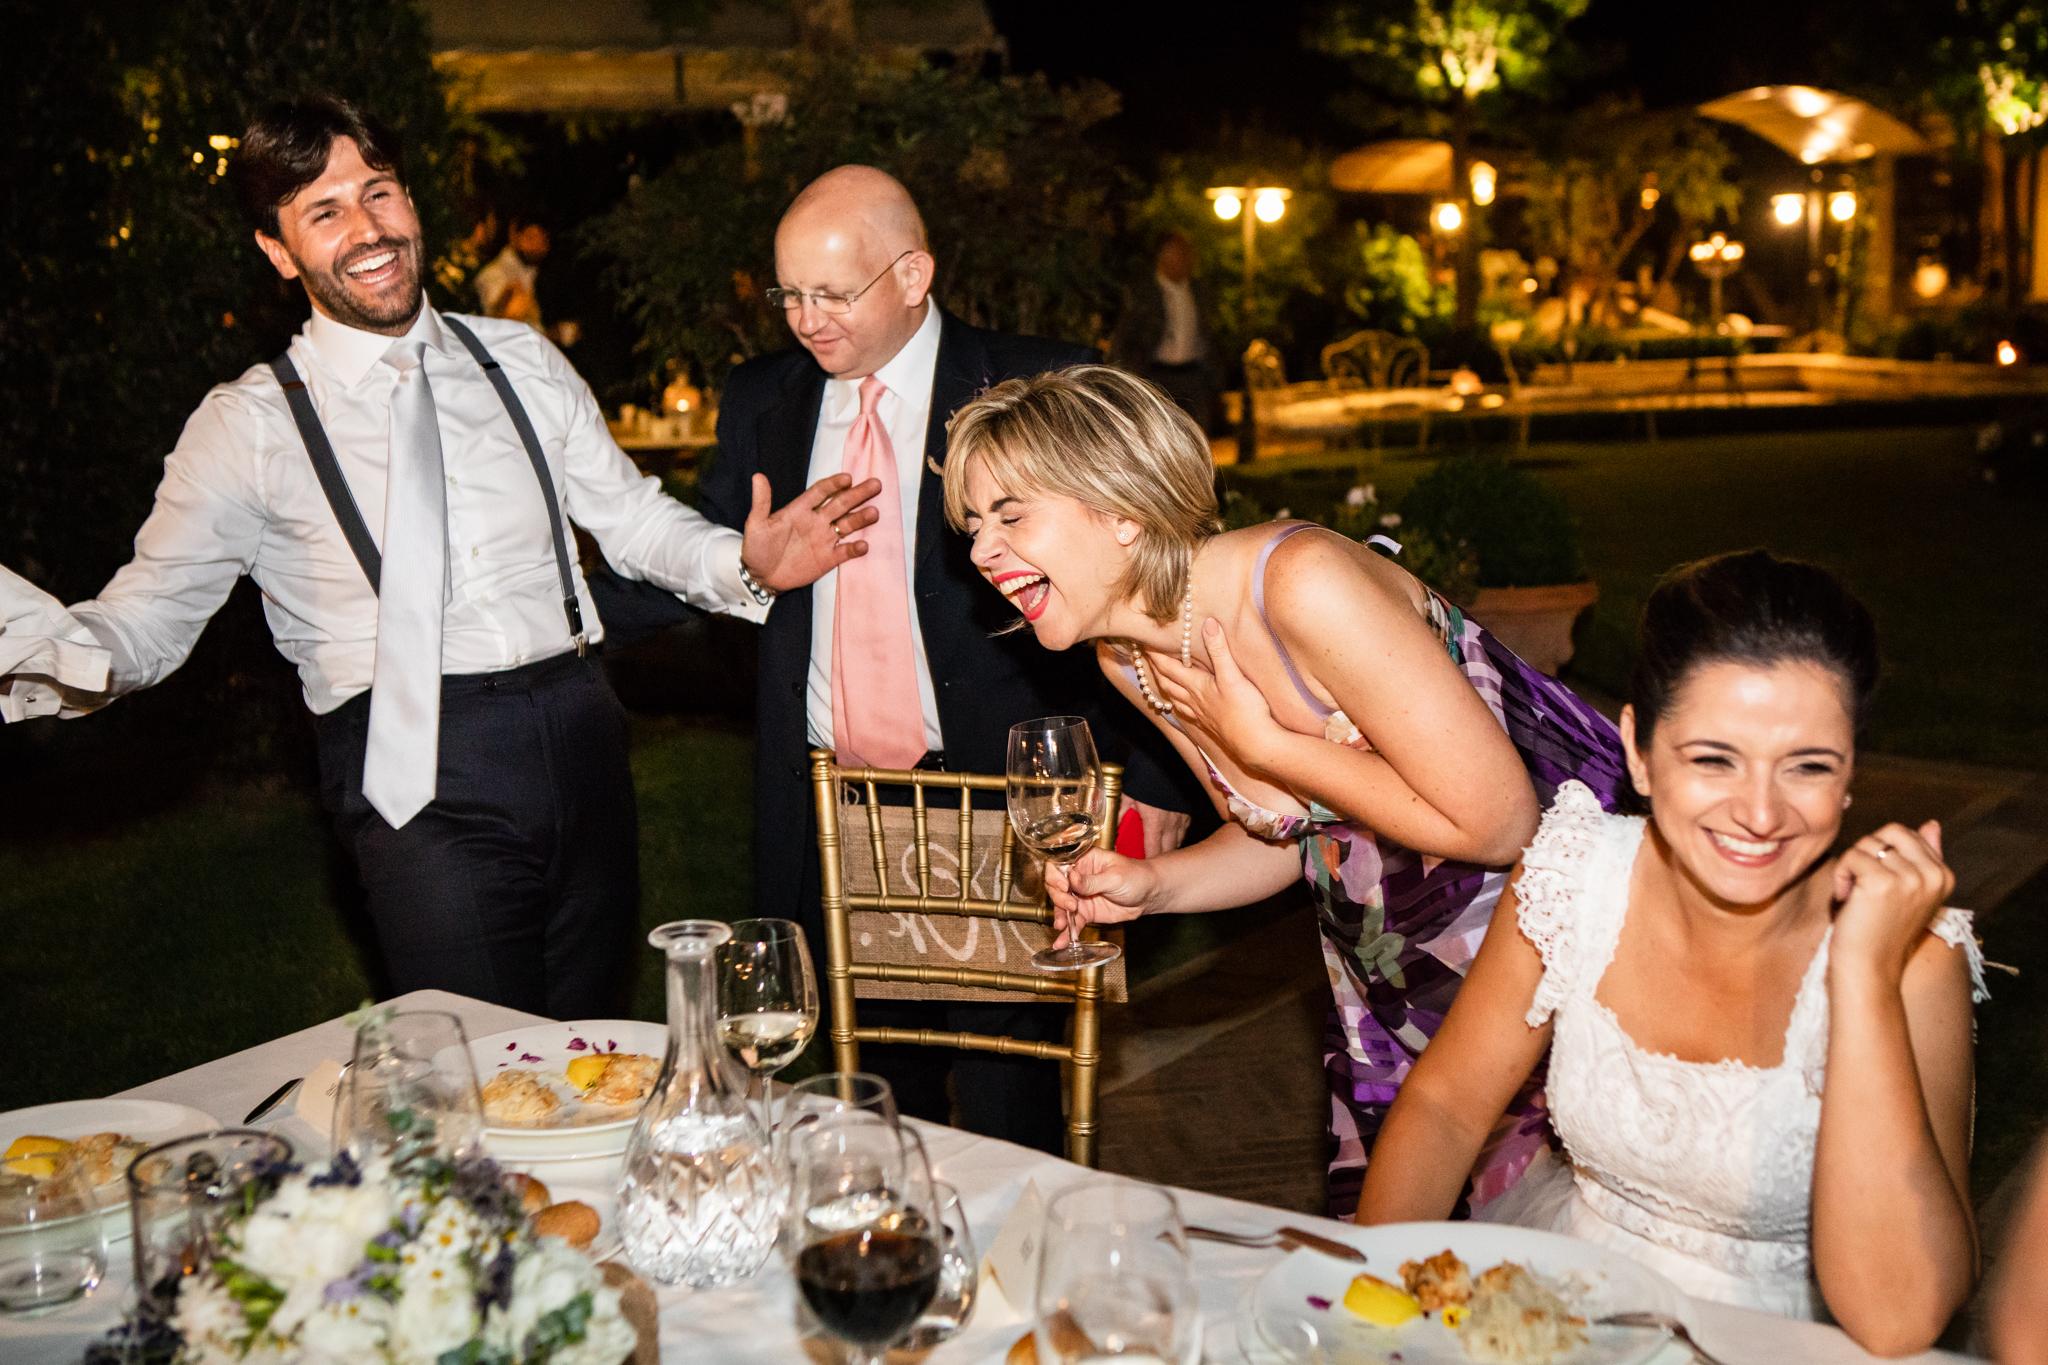 Fotografo-matrimonio-reportage-Sicilia-Catania-36.jpg